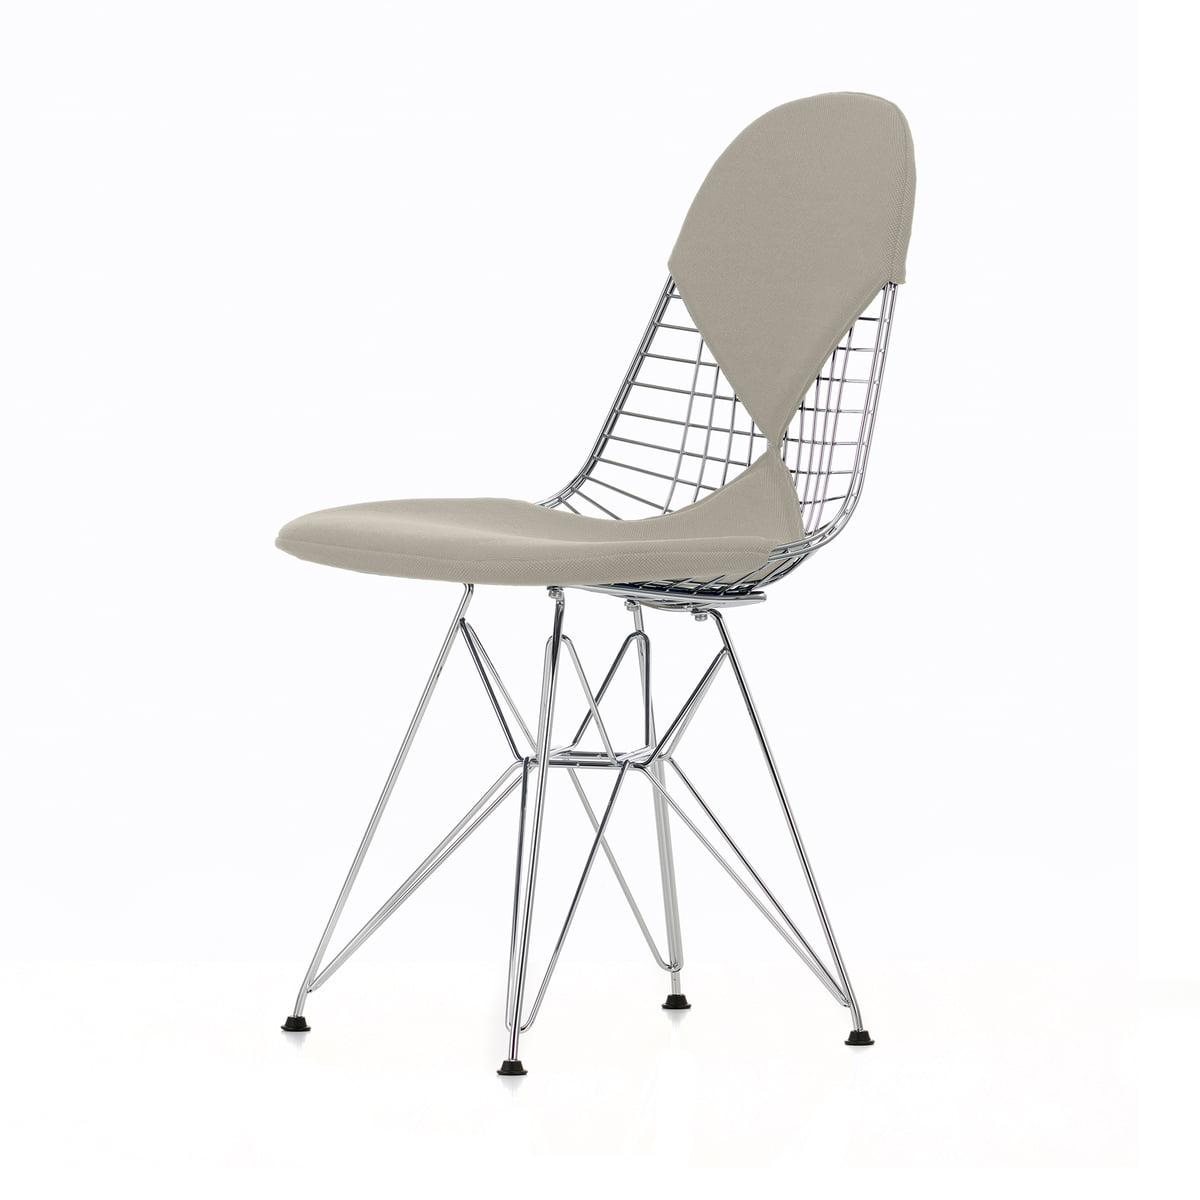 wire chair dkr 2 von vitra connox shop. Black Bedroom Furniture Sets. Home Design Ideas